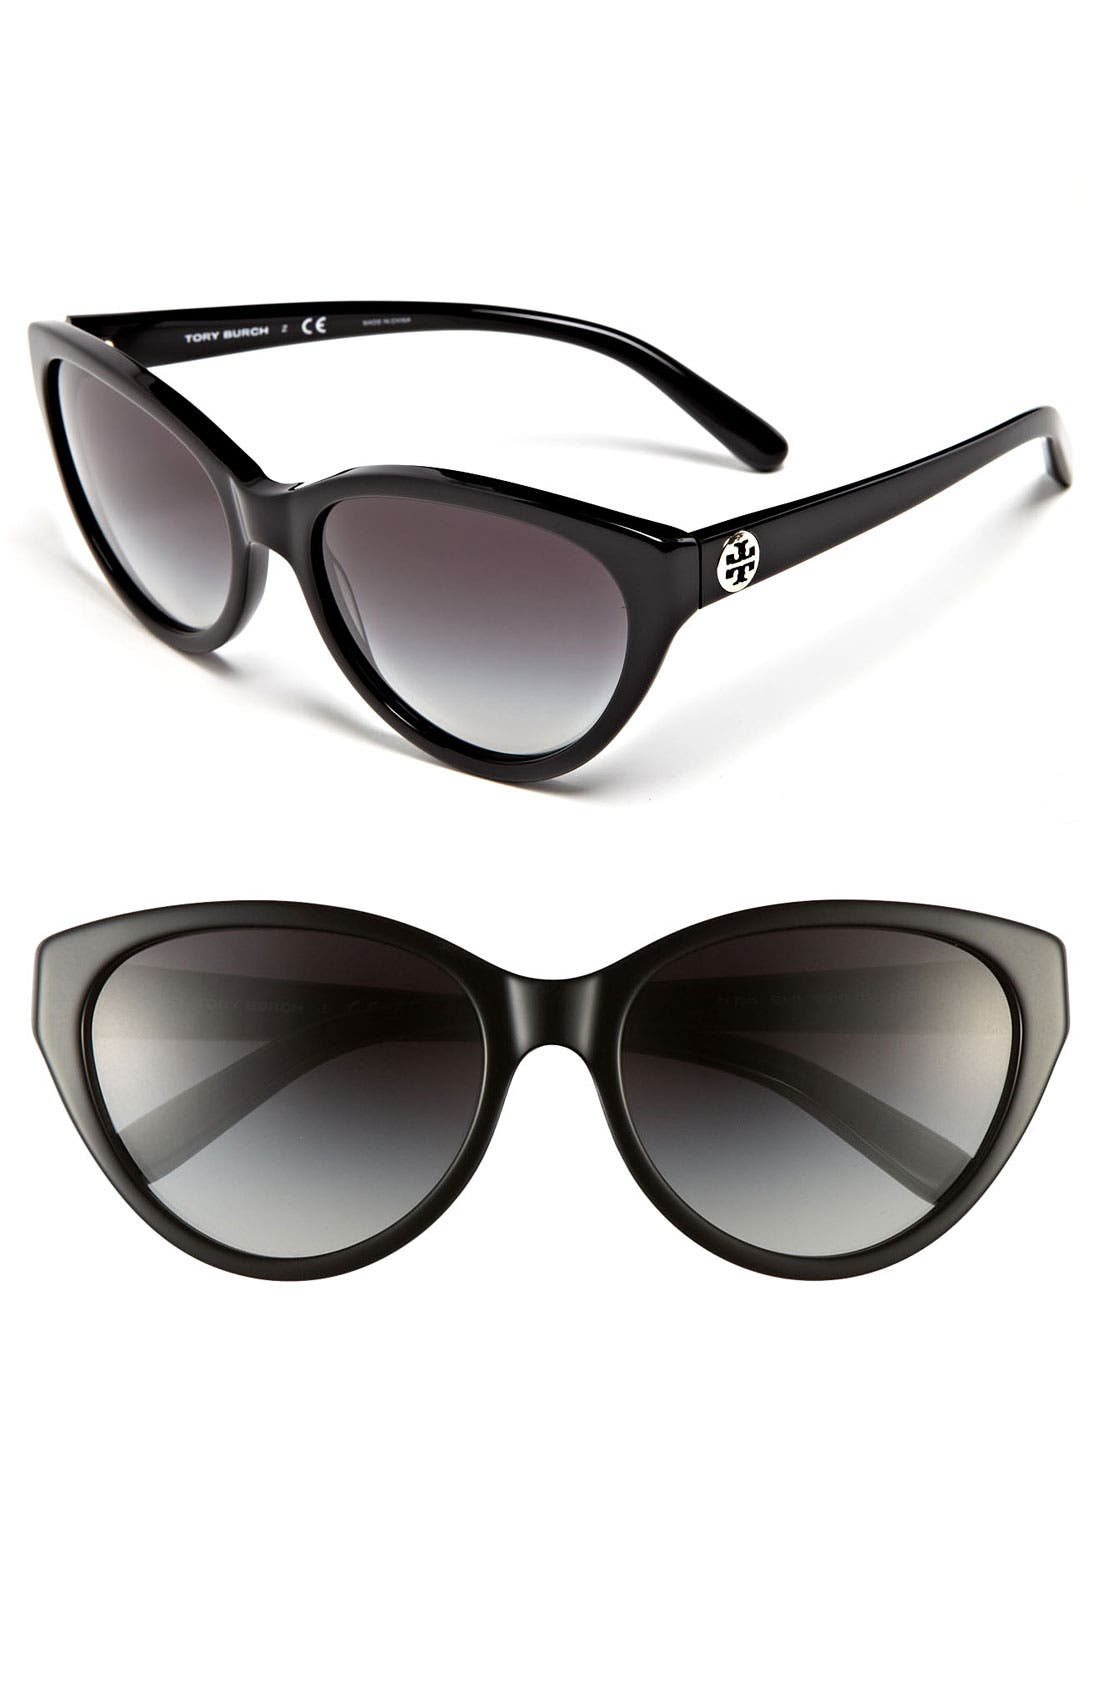 Main Image - Tory Burch 57mm Retro Sunglasses